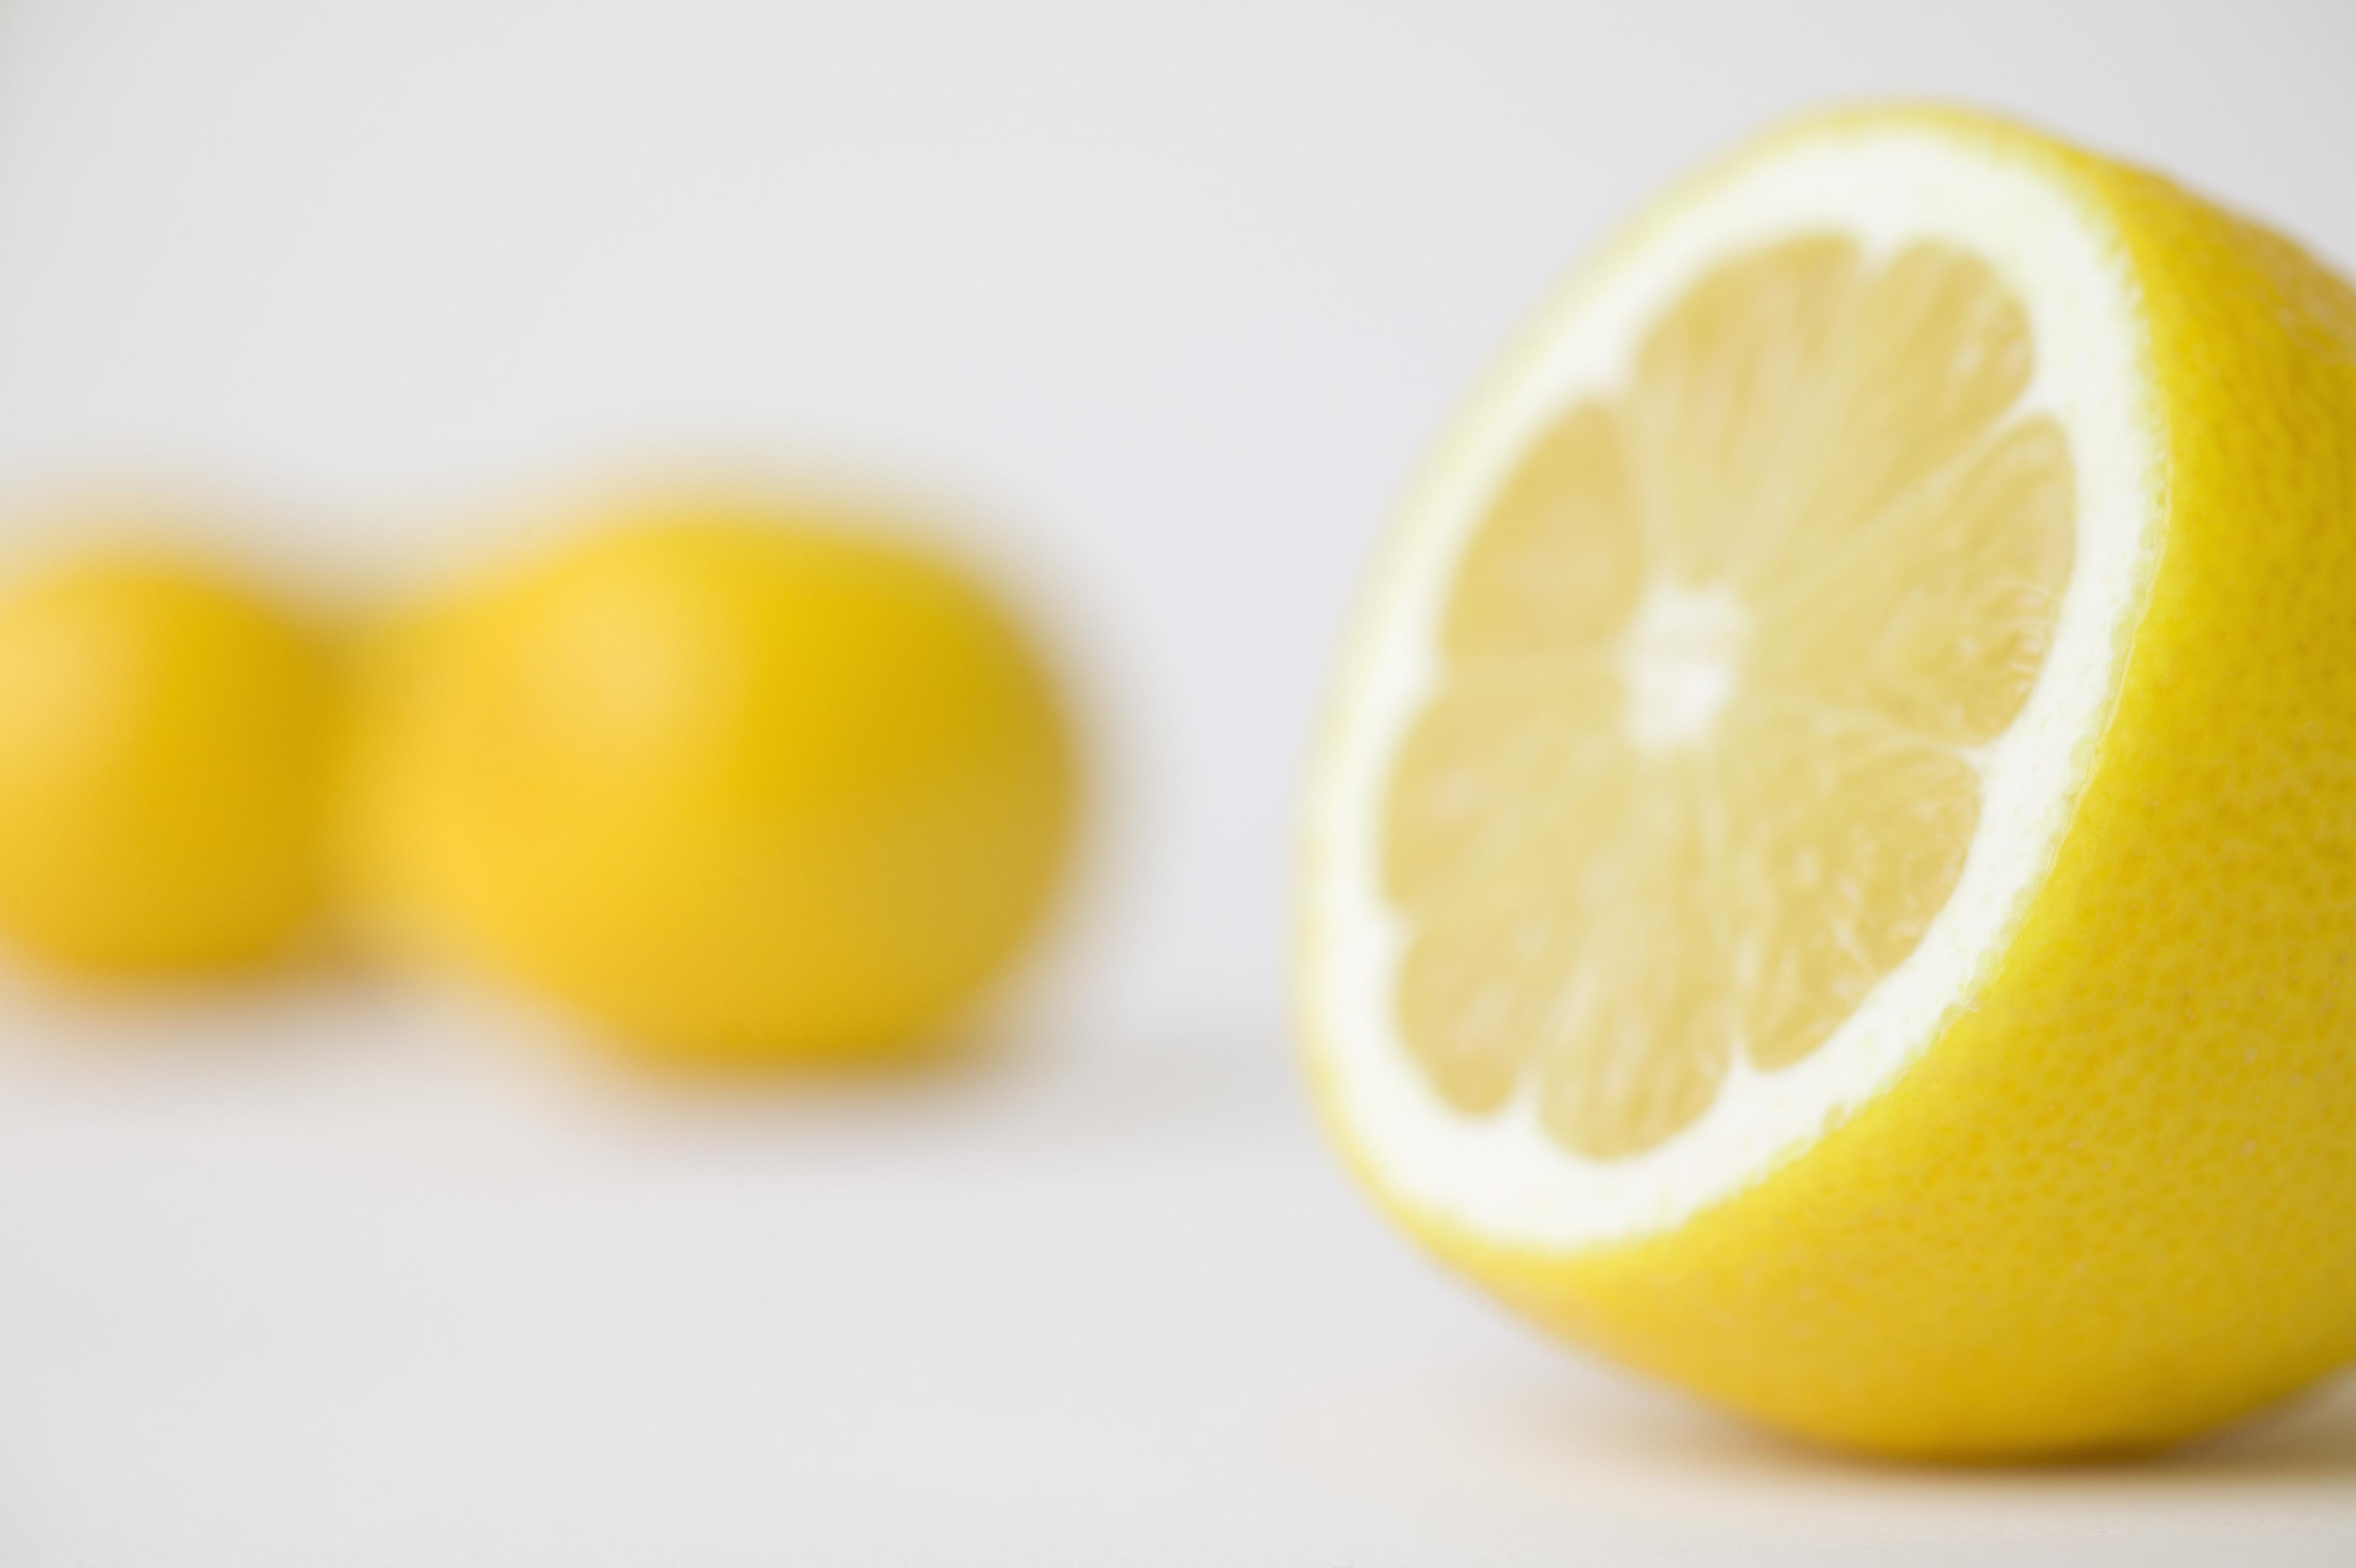 Lemons stop sperm swimming - study - NZ Herald